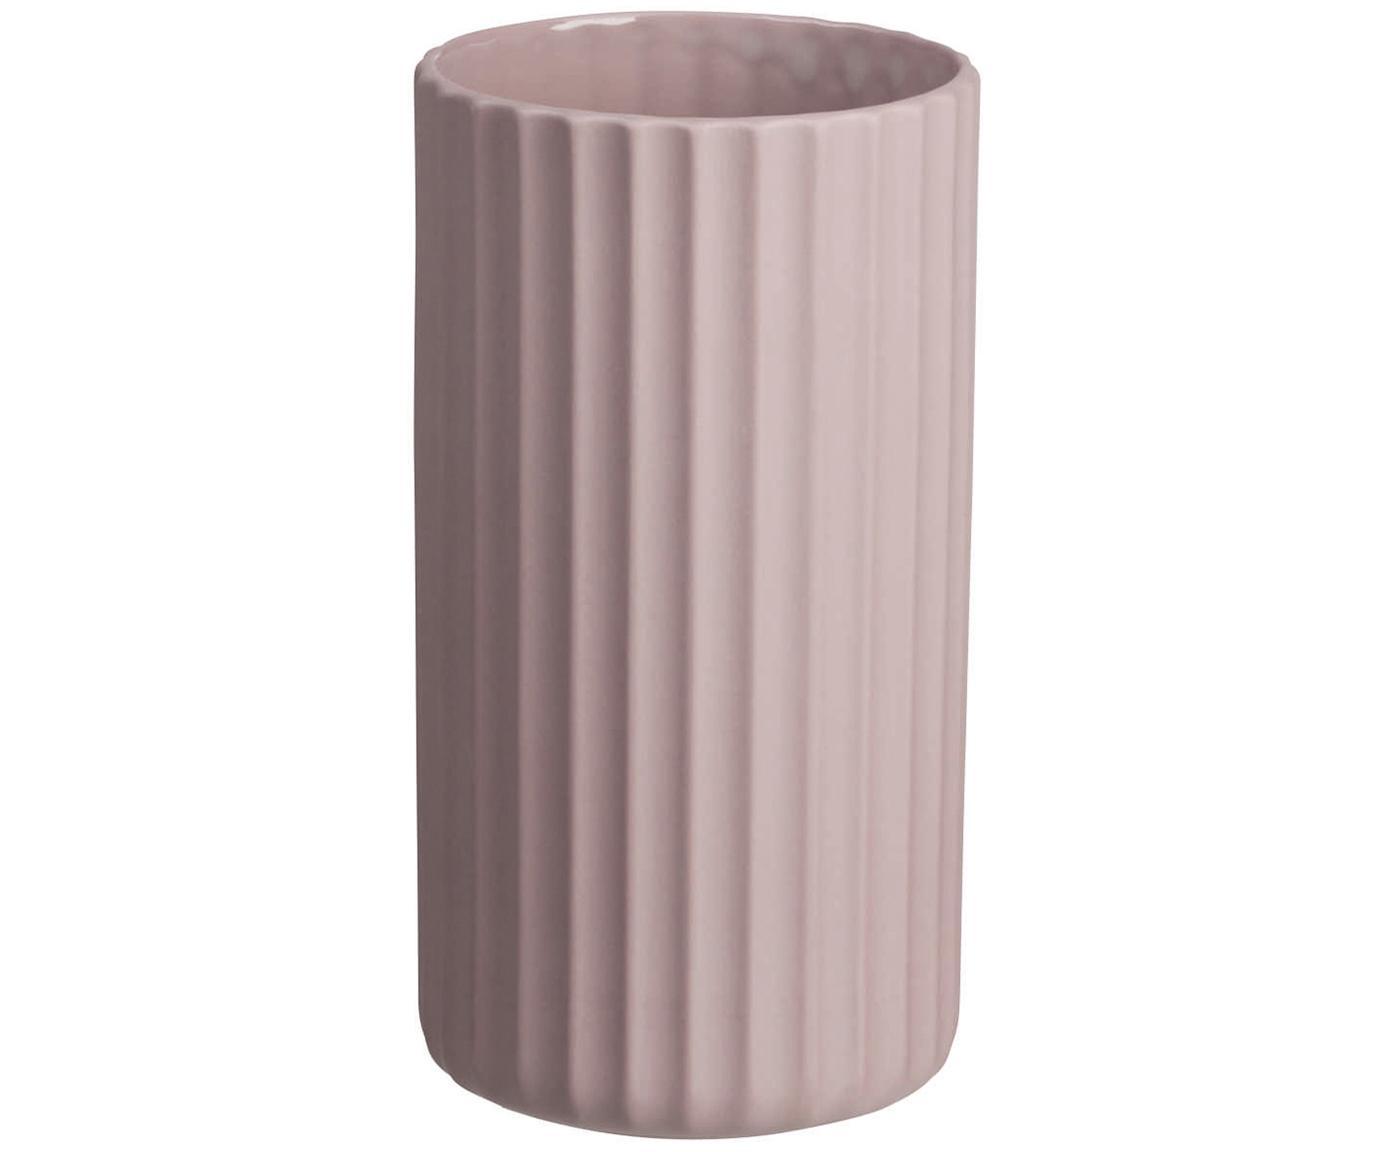 Jarrón artesanal de porcelana Yoko, Porcelana, Rosa, Ø 9 x Al 16 cm